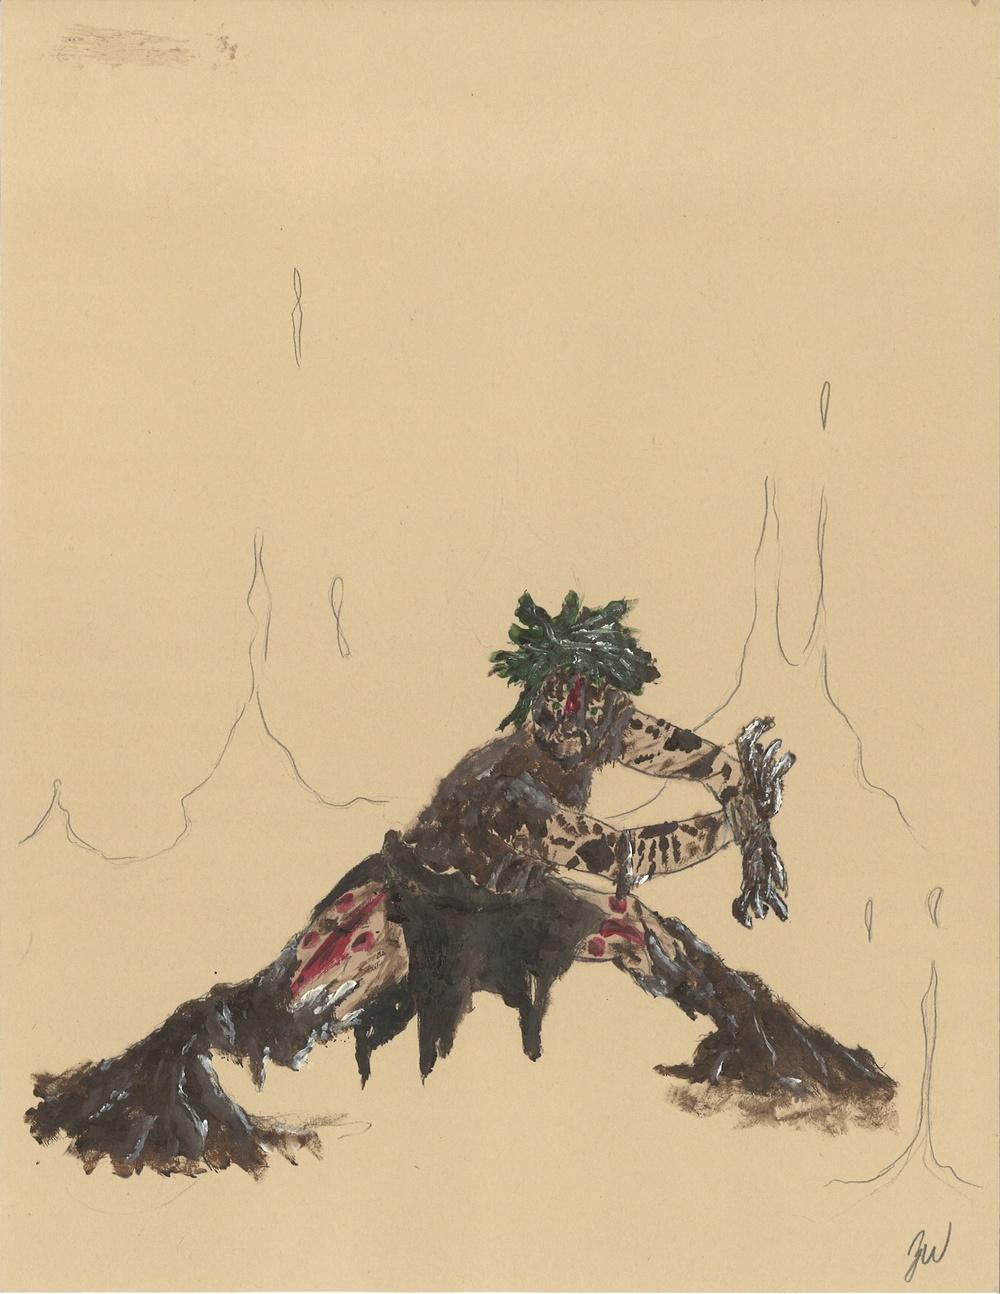 Tempest Caliban Rendering.jpg